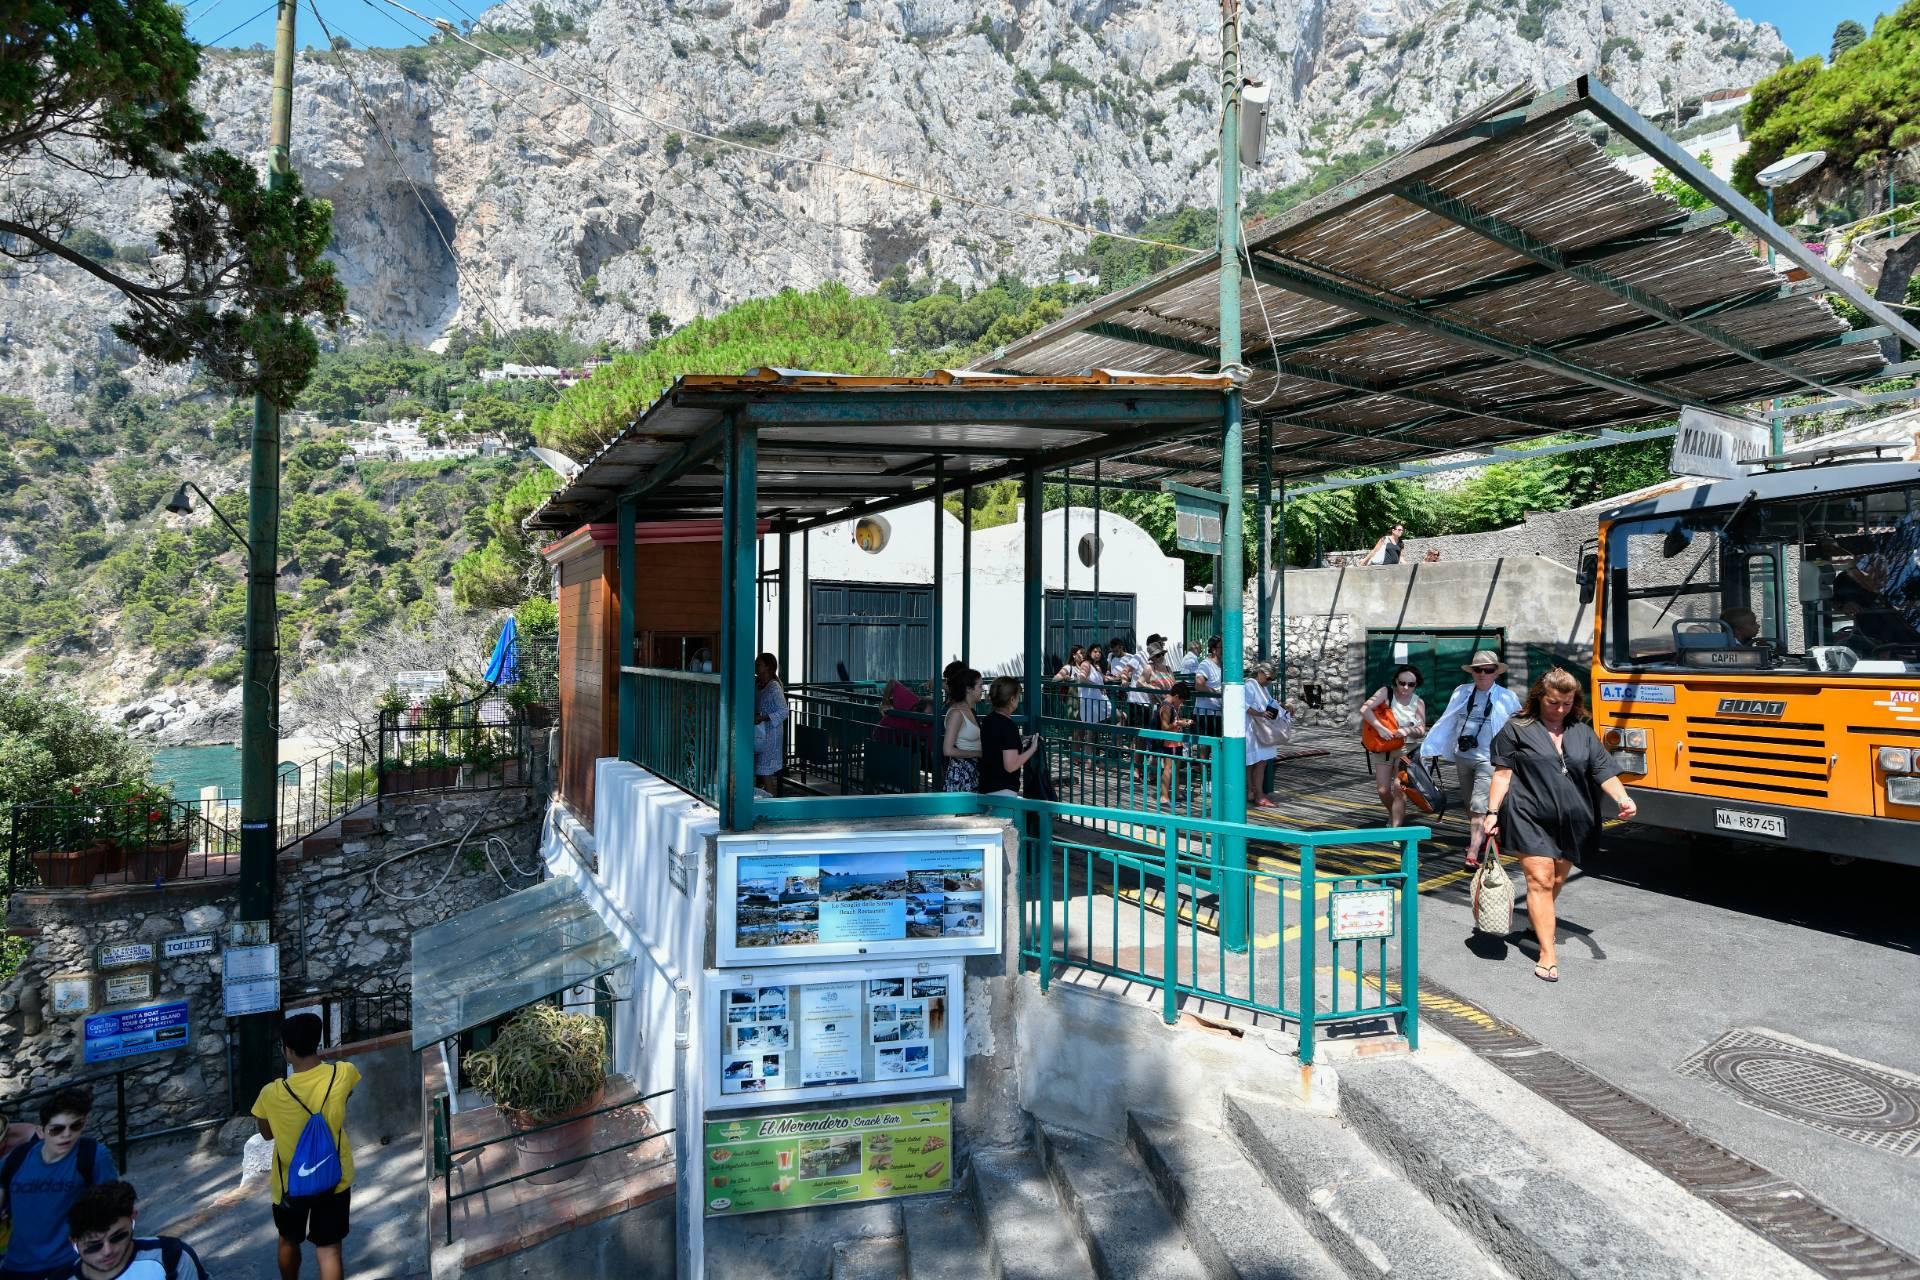 Villa Capri Vendita € 2.000.000 215 mq riscaldamento ...